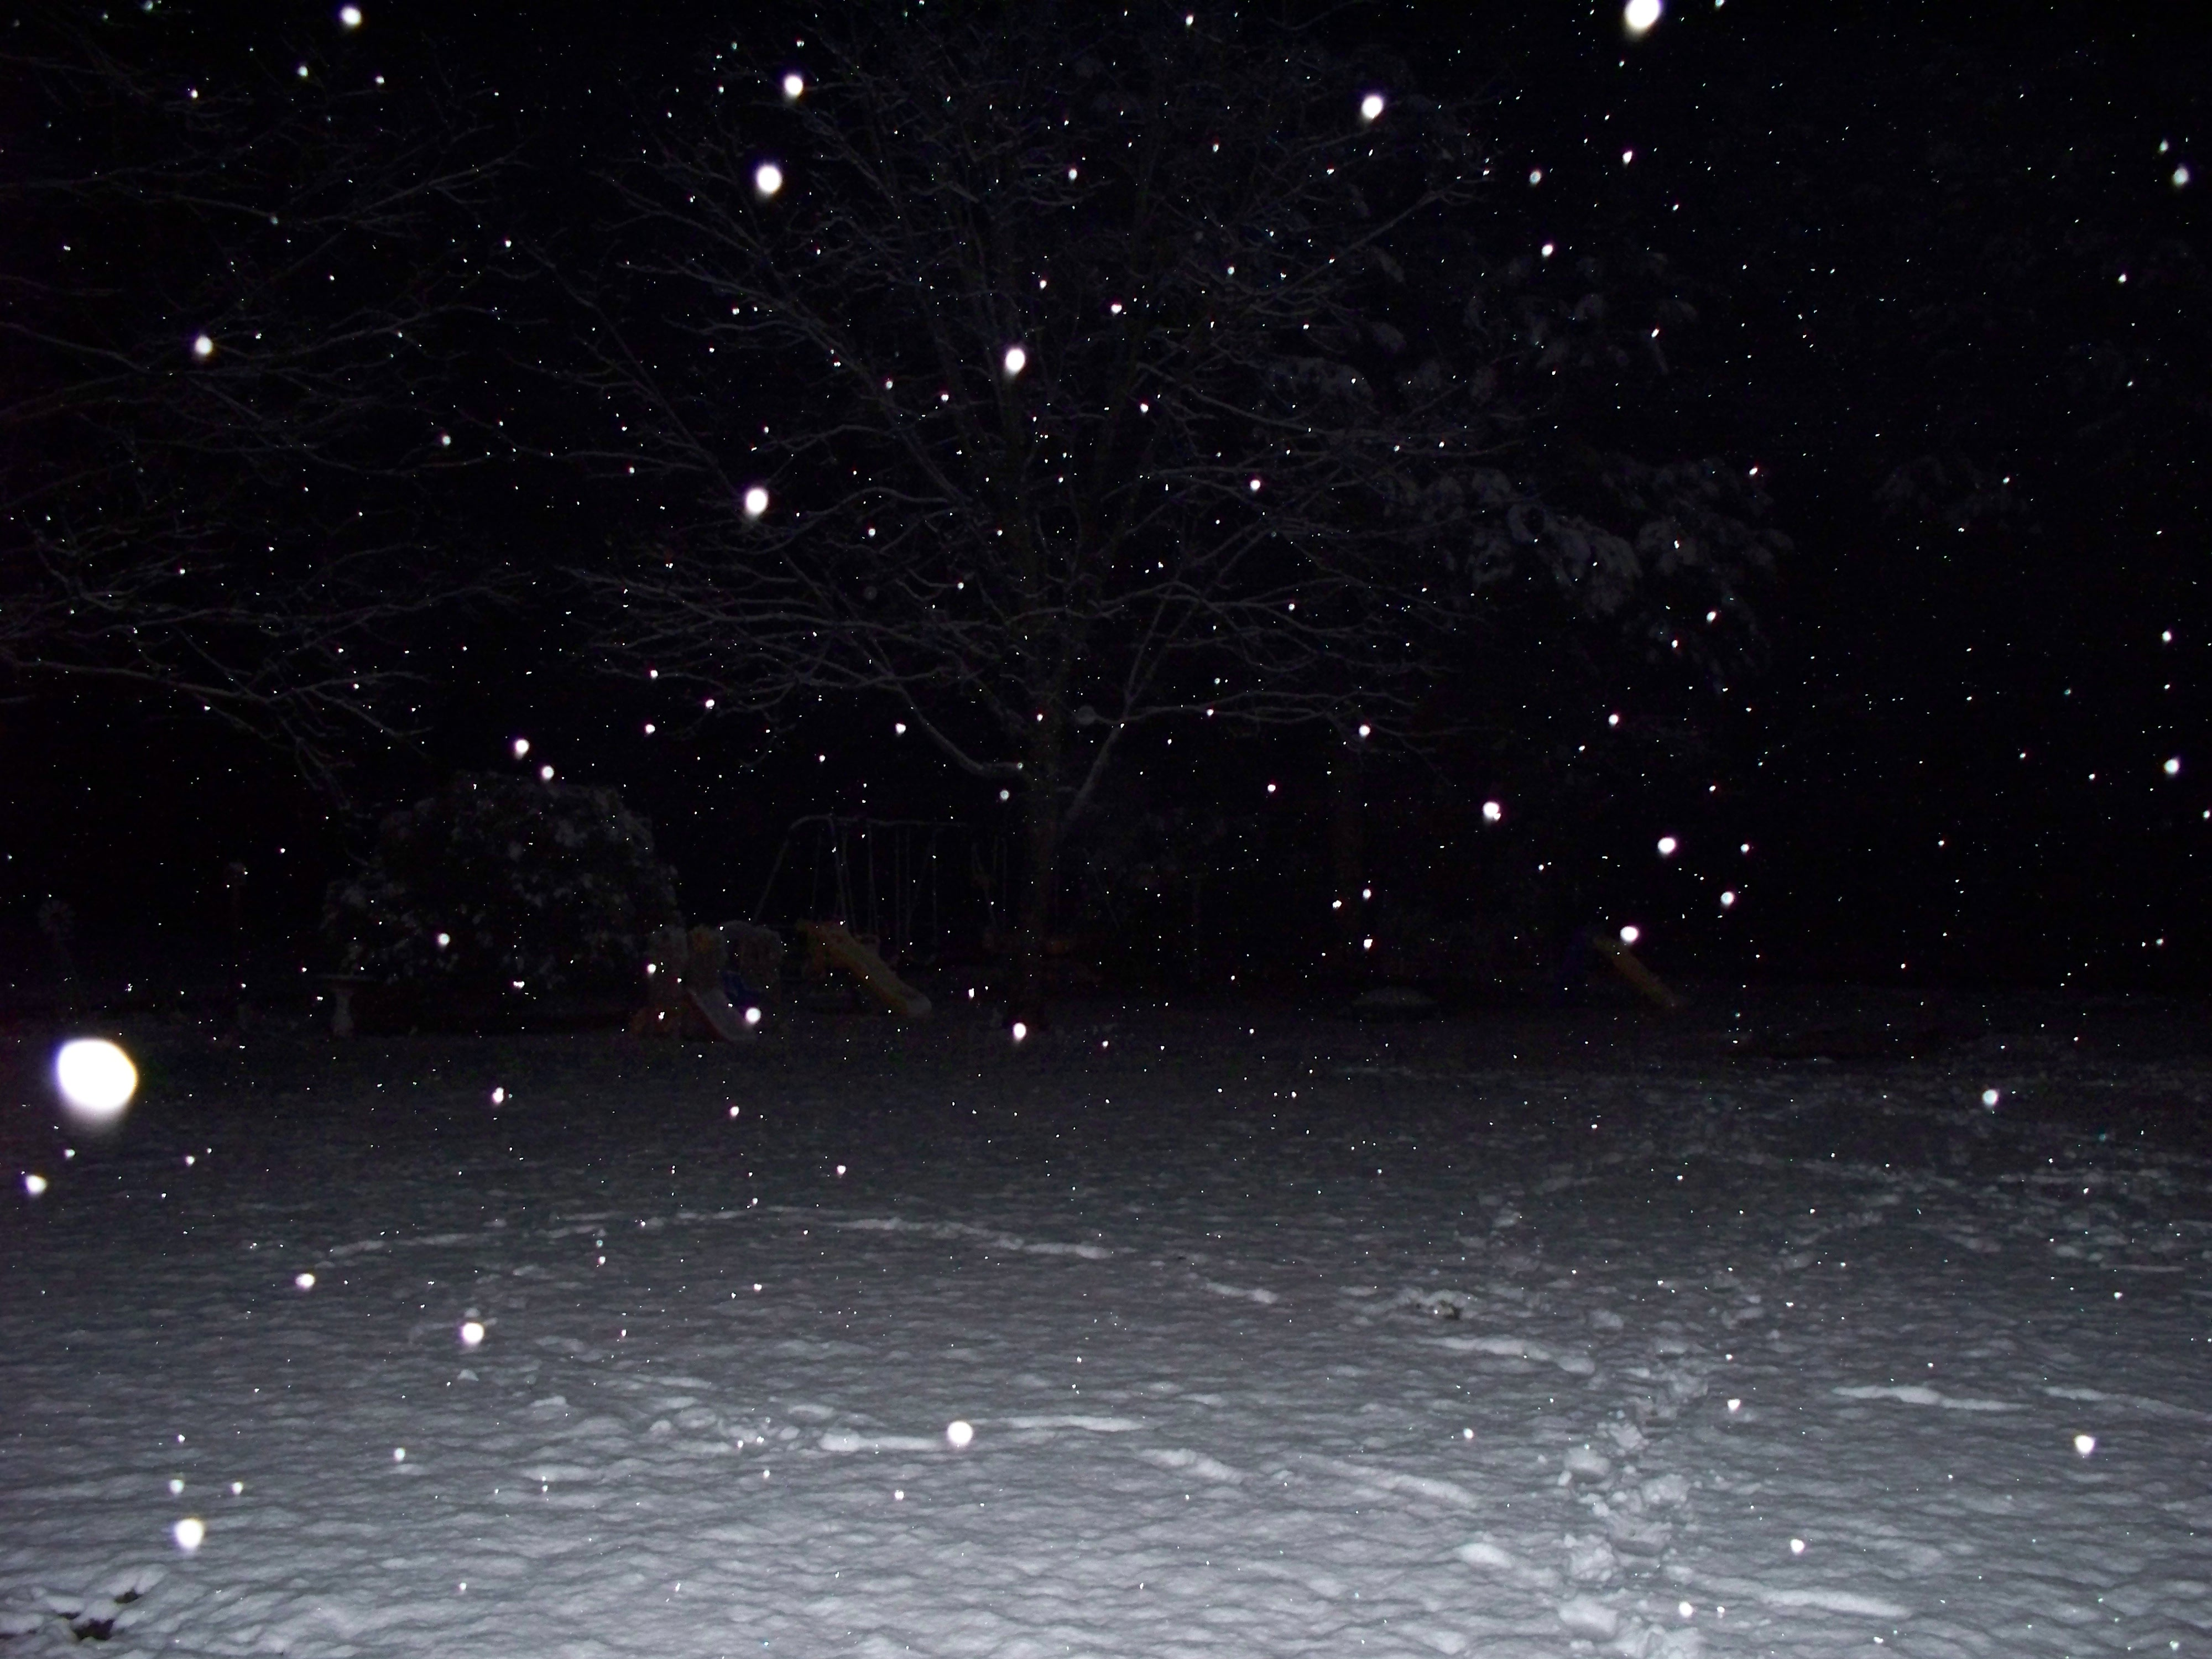 Snow at Night - Bing images